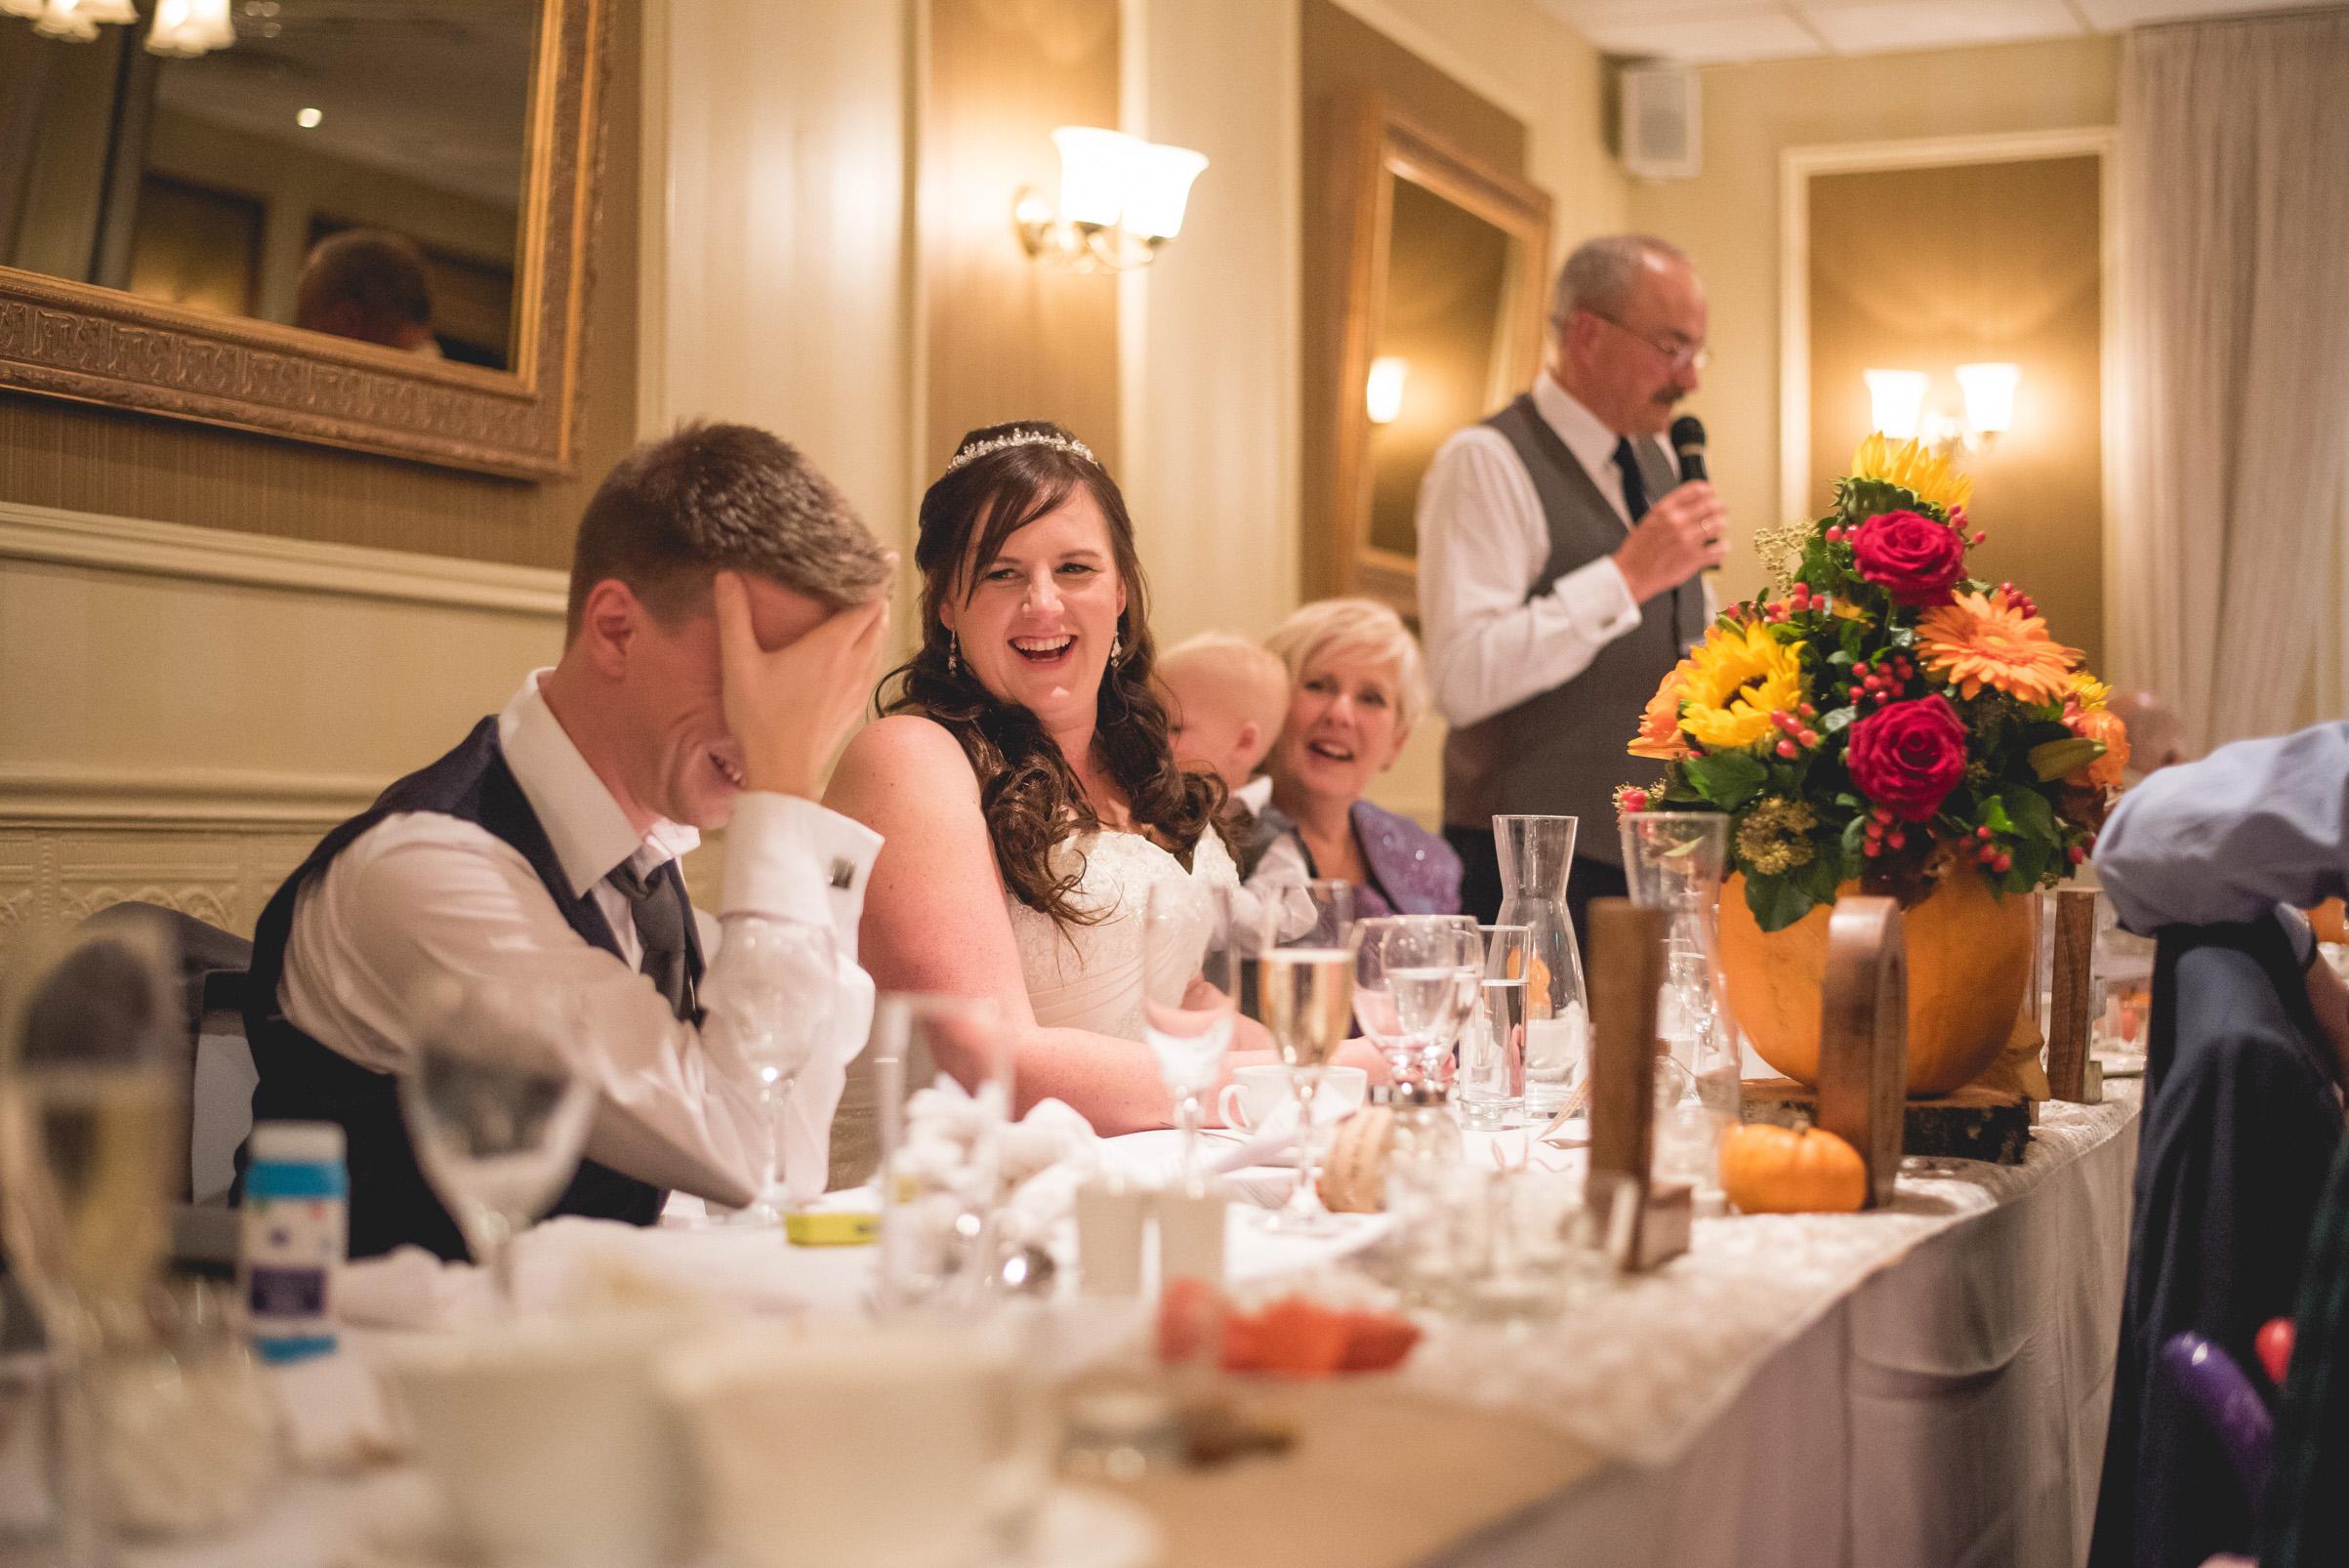 The+Fairlawns+wedding+Aldridge+StLukes+Church-187.jpg